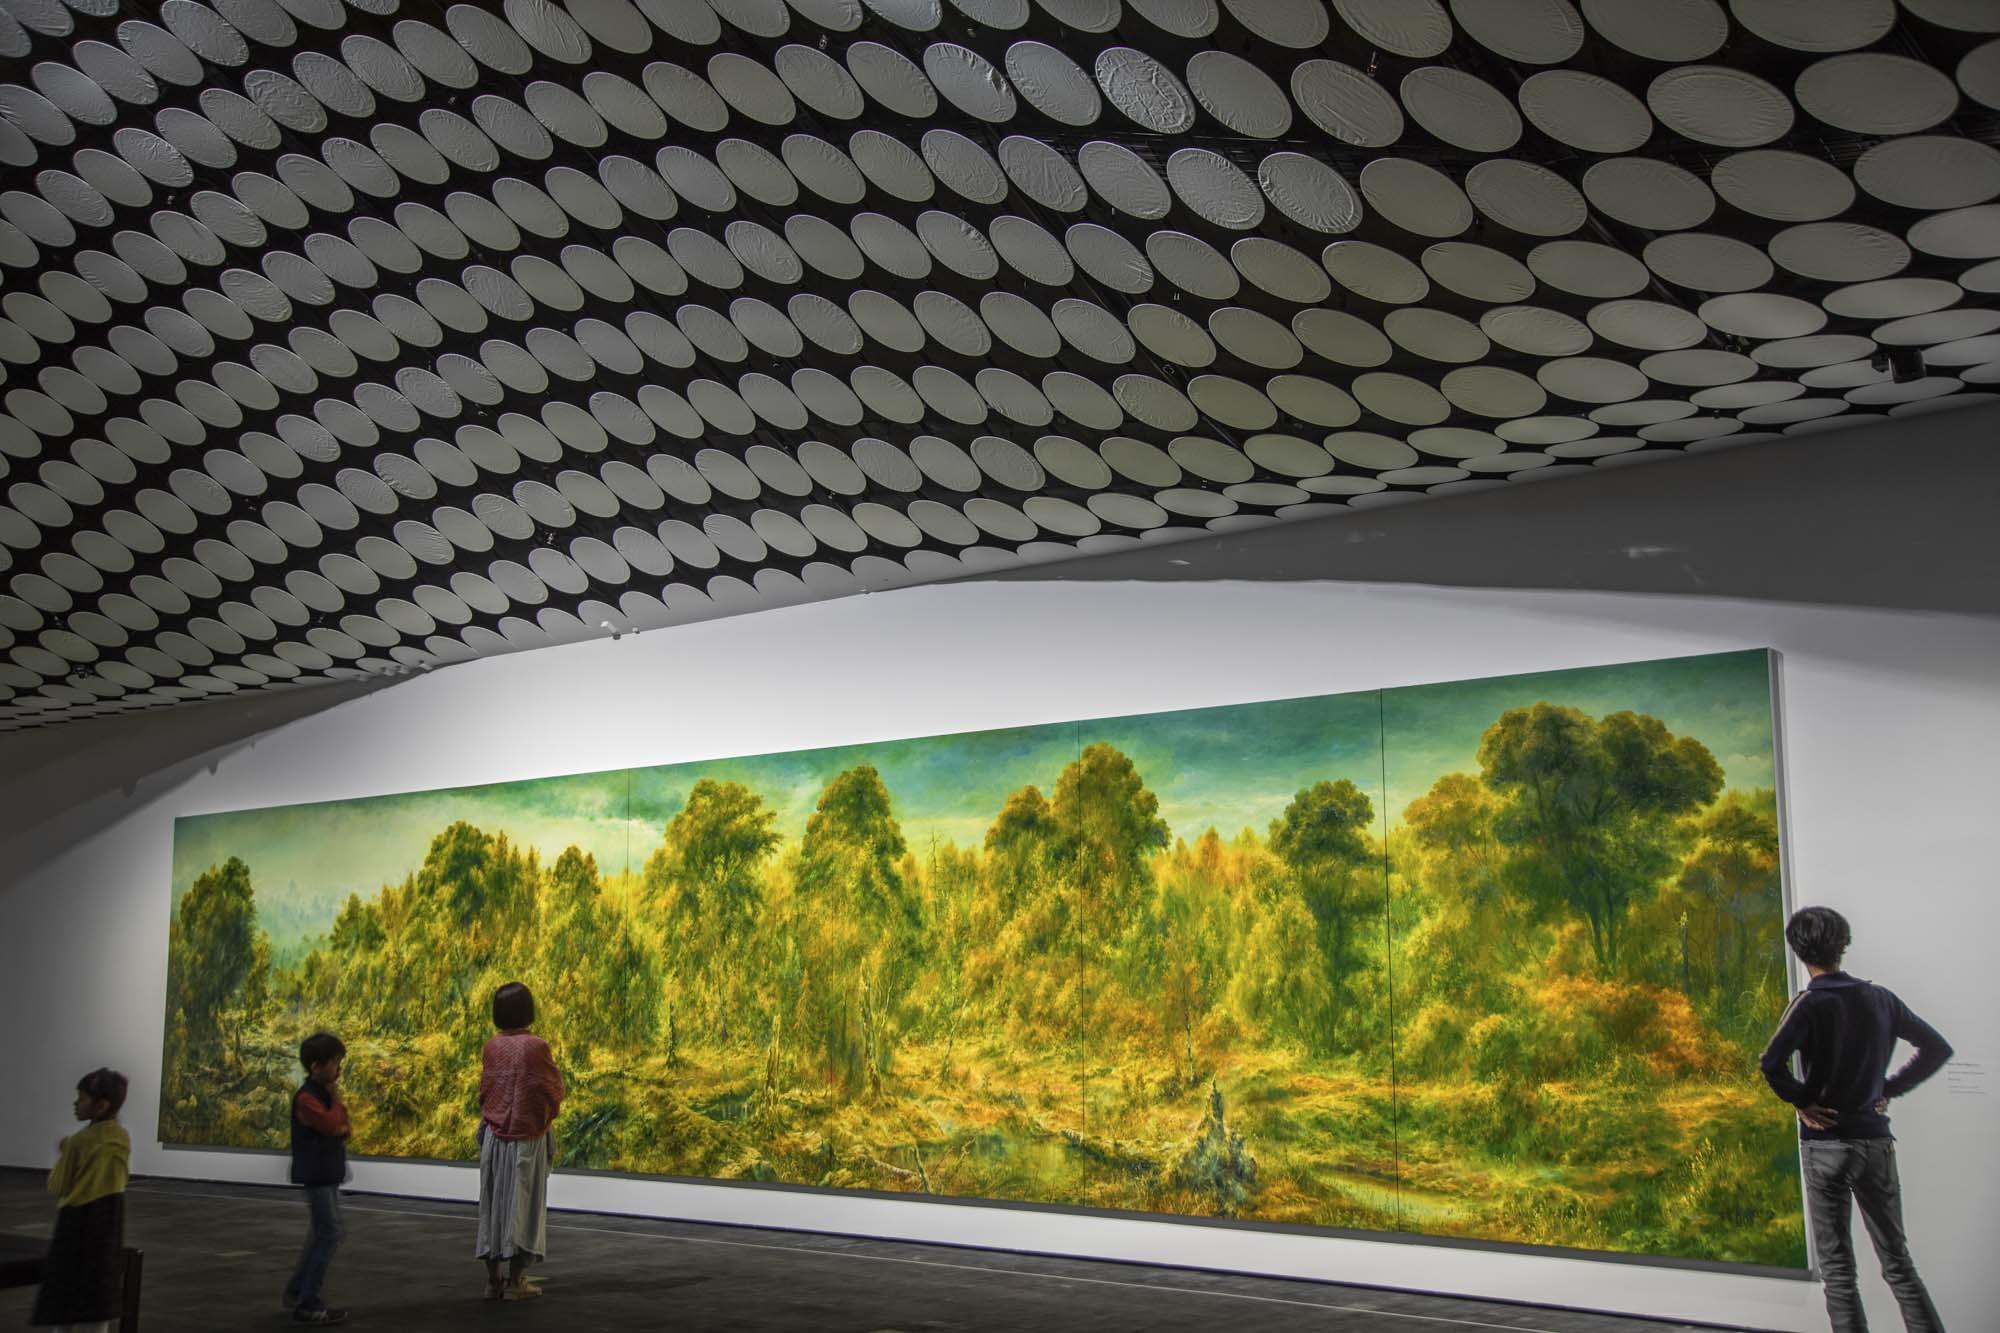 Finnland, Helsinki, Amos Rex im Lasipalatsi, unterirdisches Amos Anderson Museum, riesiges Gemälde von Petri Ala-Maunus